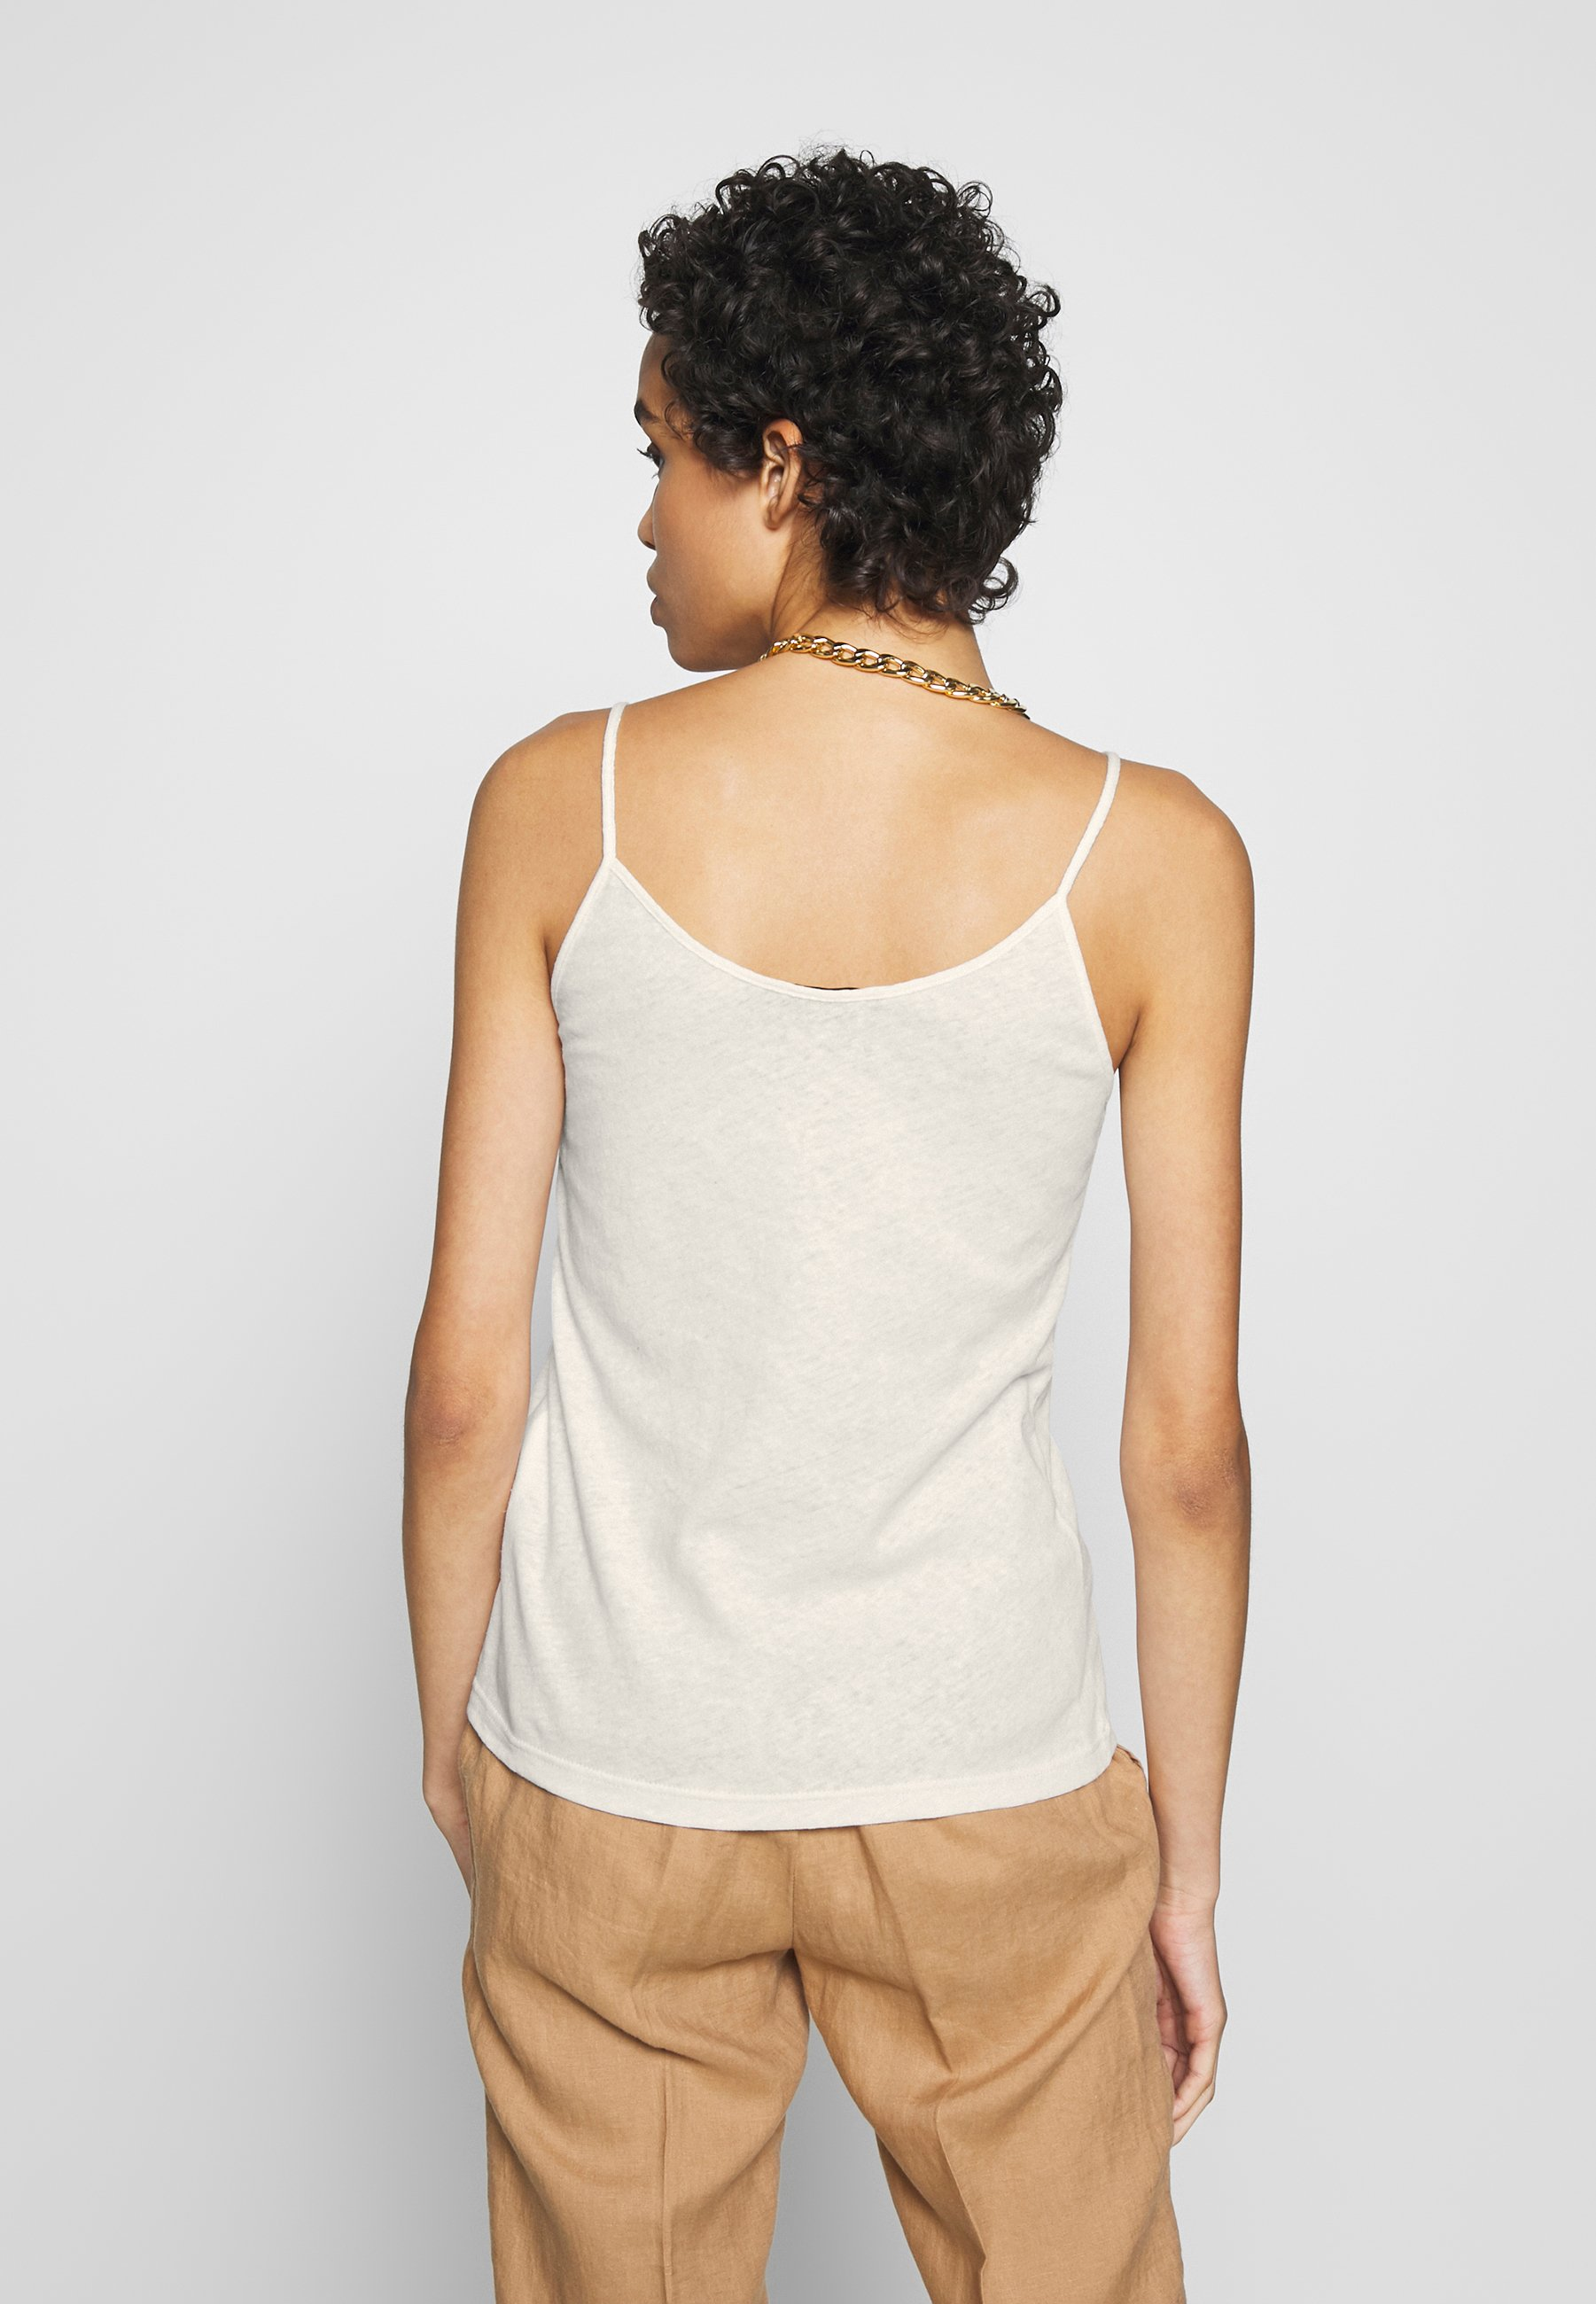 Zign Toppe - cloud dancer - Damer T-shirts & toppe d0rvq